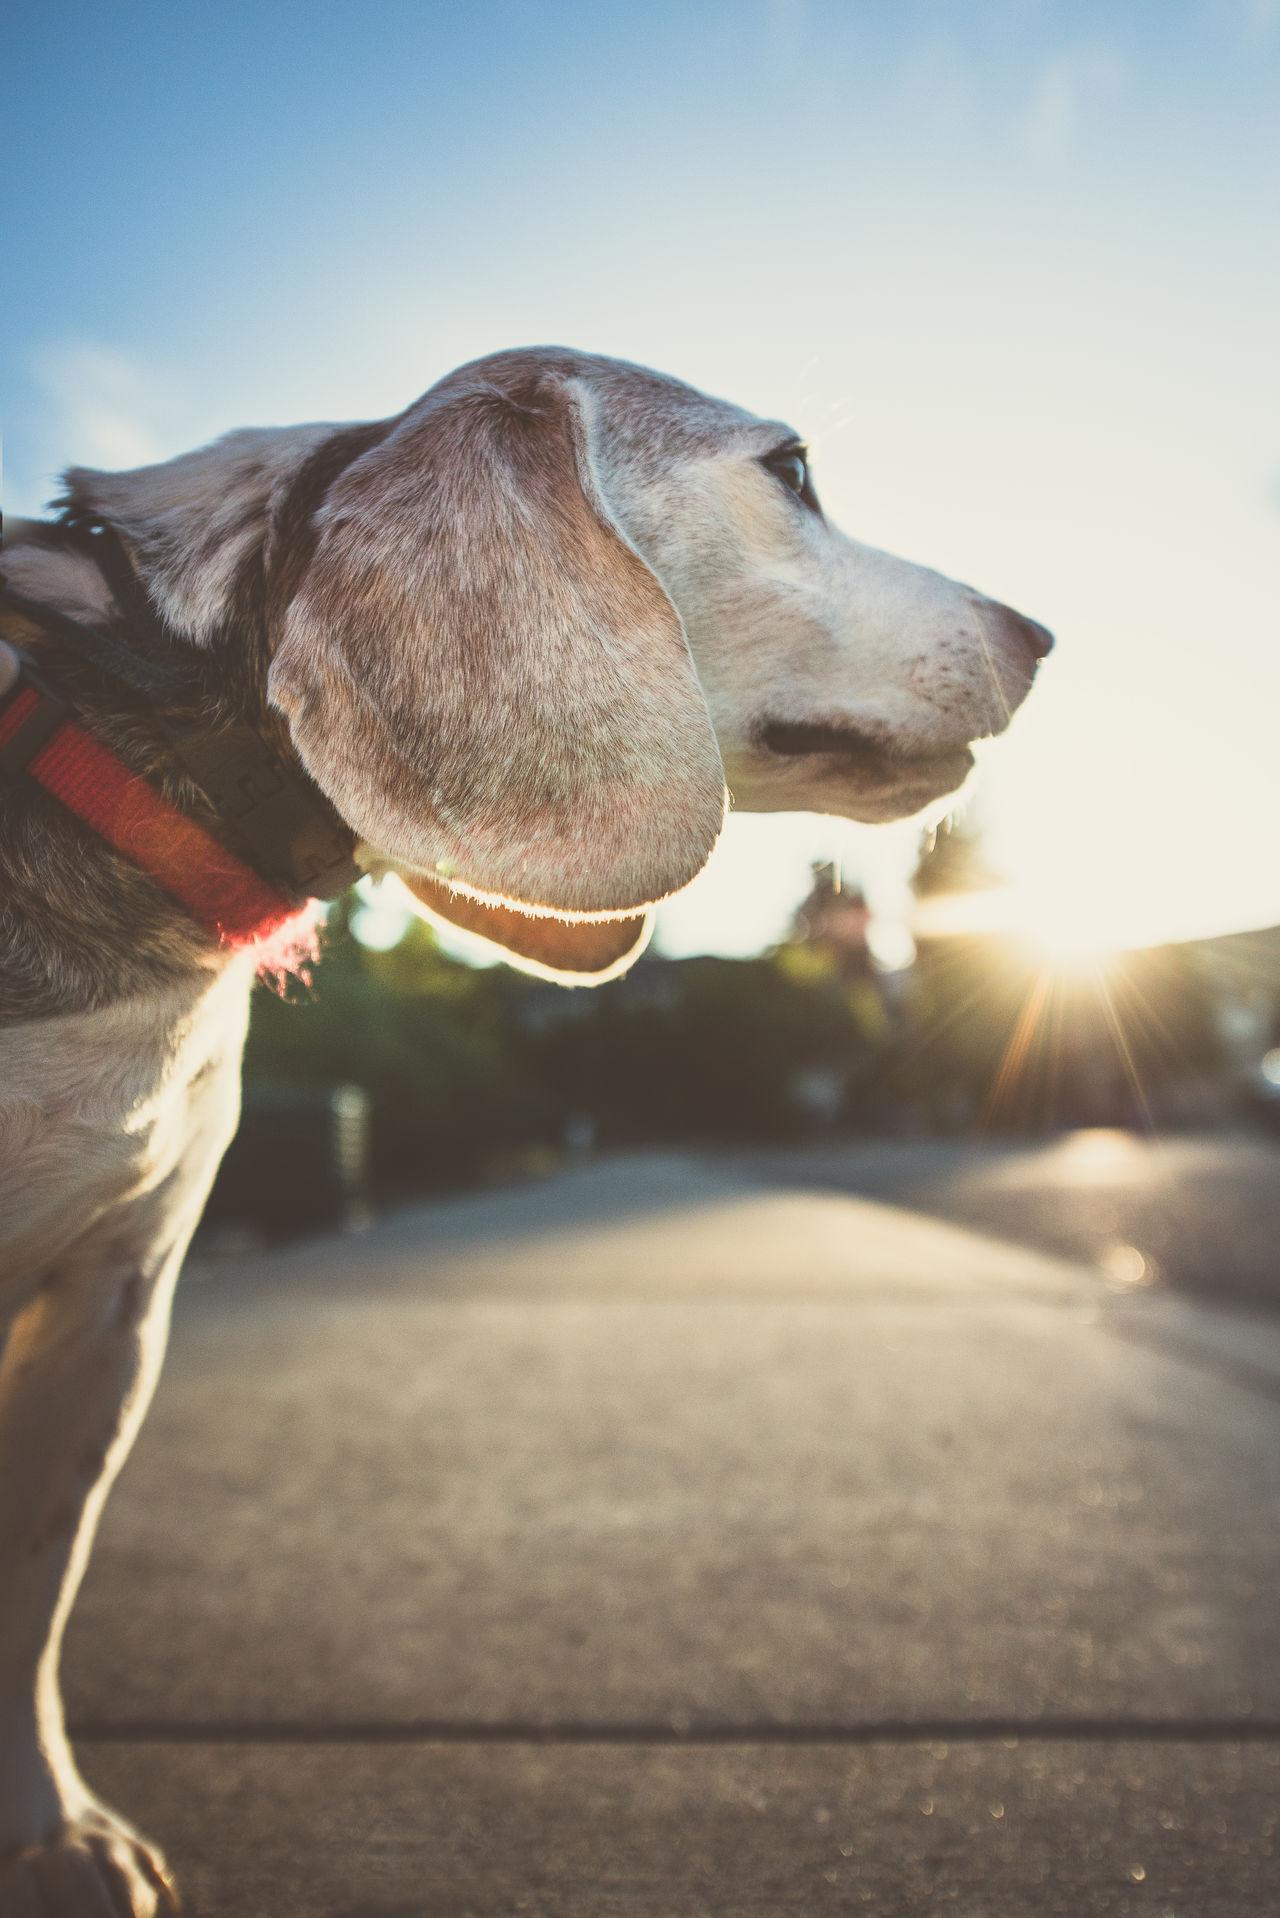 Animal Themes Beagle Beaglelove Beaglelovers Dog Love Dog, Hanging Out, Enjoying Life Dogs Of EyeEm One Animal Pets Petslife Petsofinstagram Petstagram Sunbeam Sunlight First Eyeem Photo